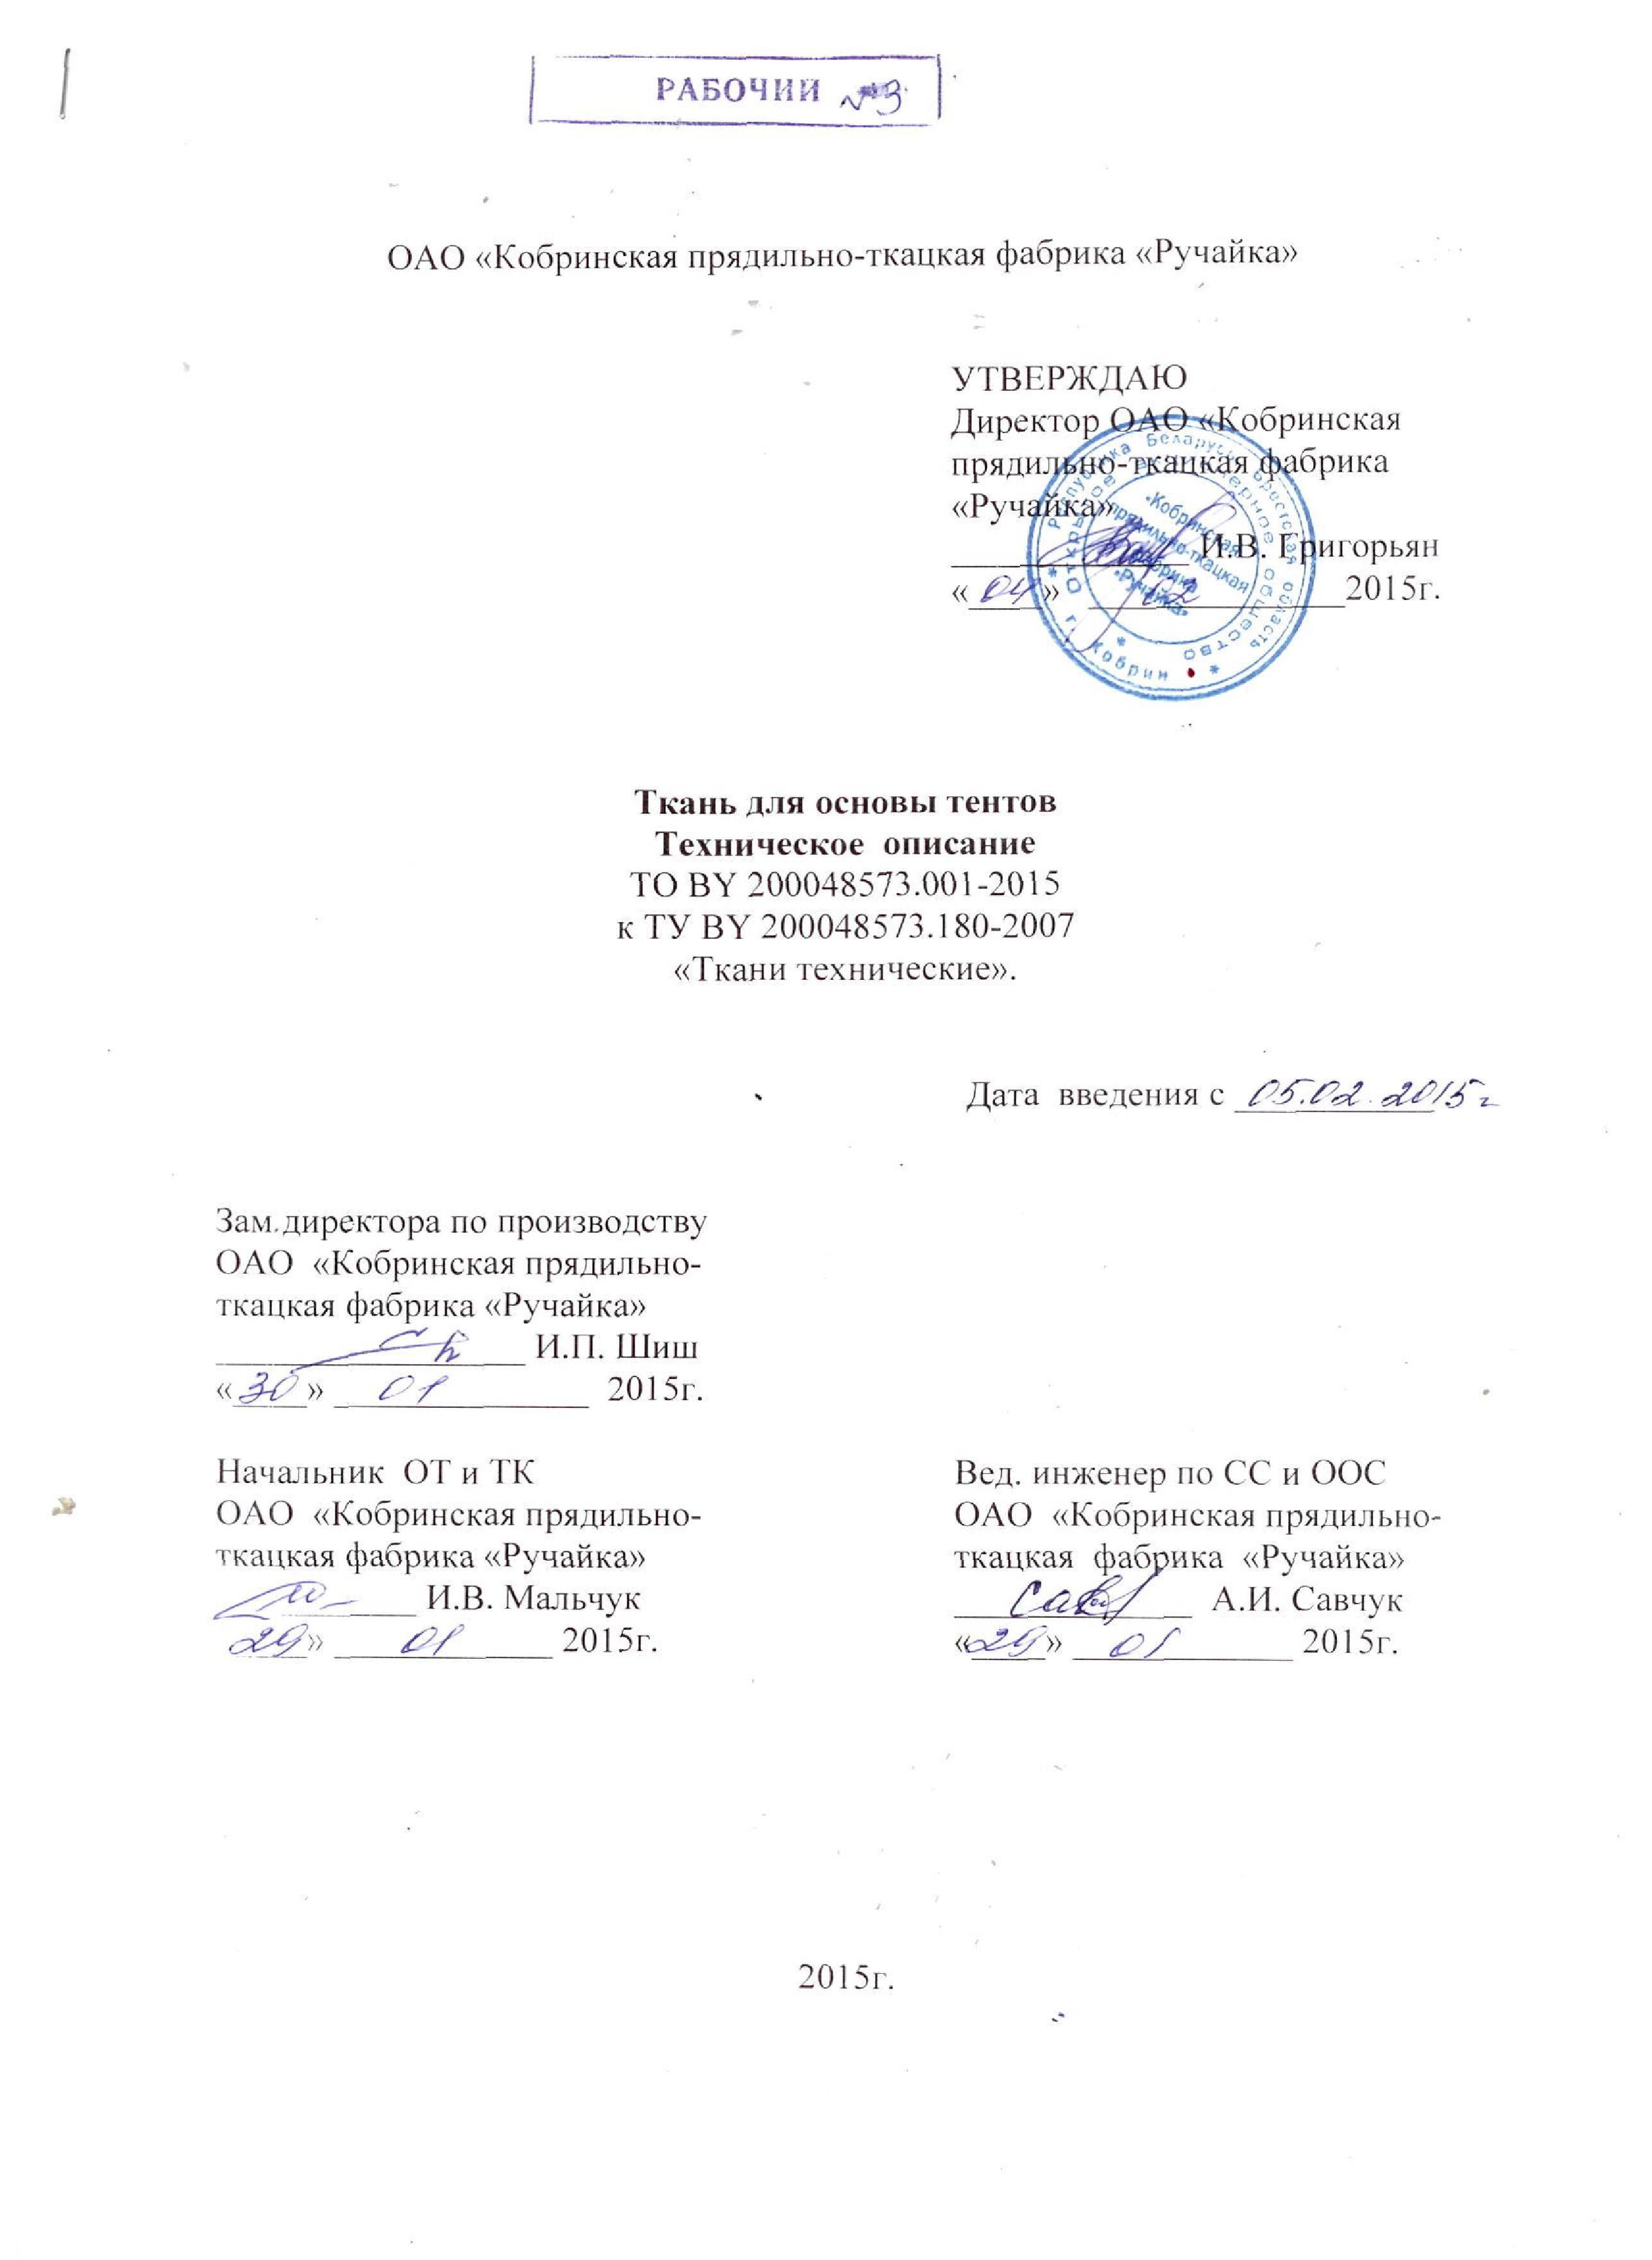 Сертификат МТМ-550, 750, 900